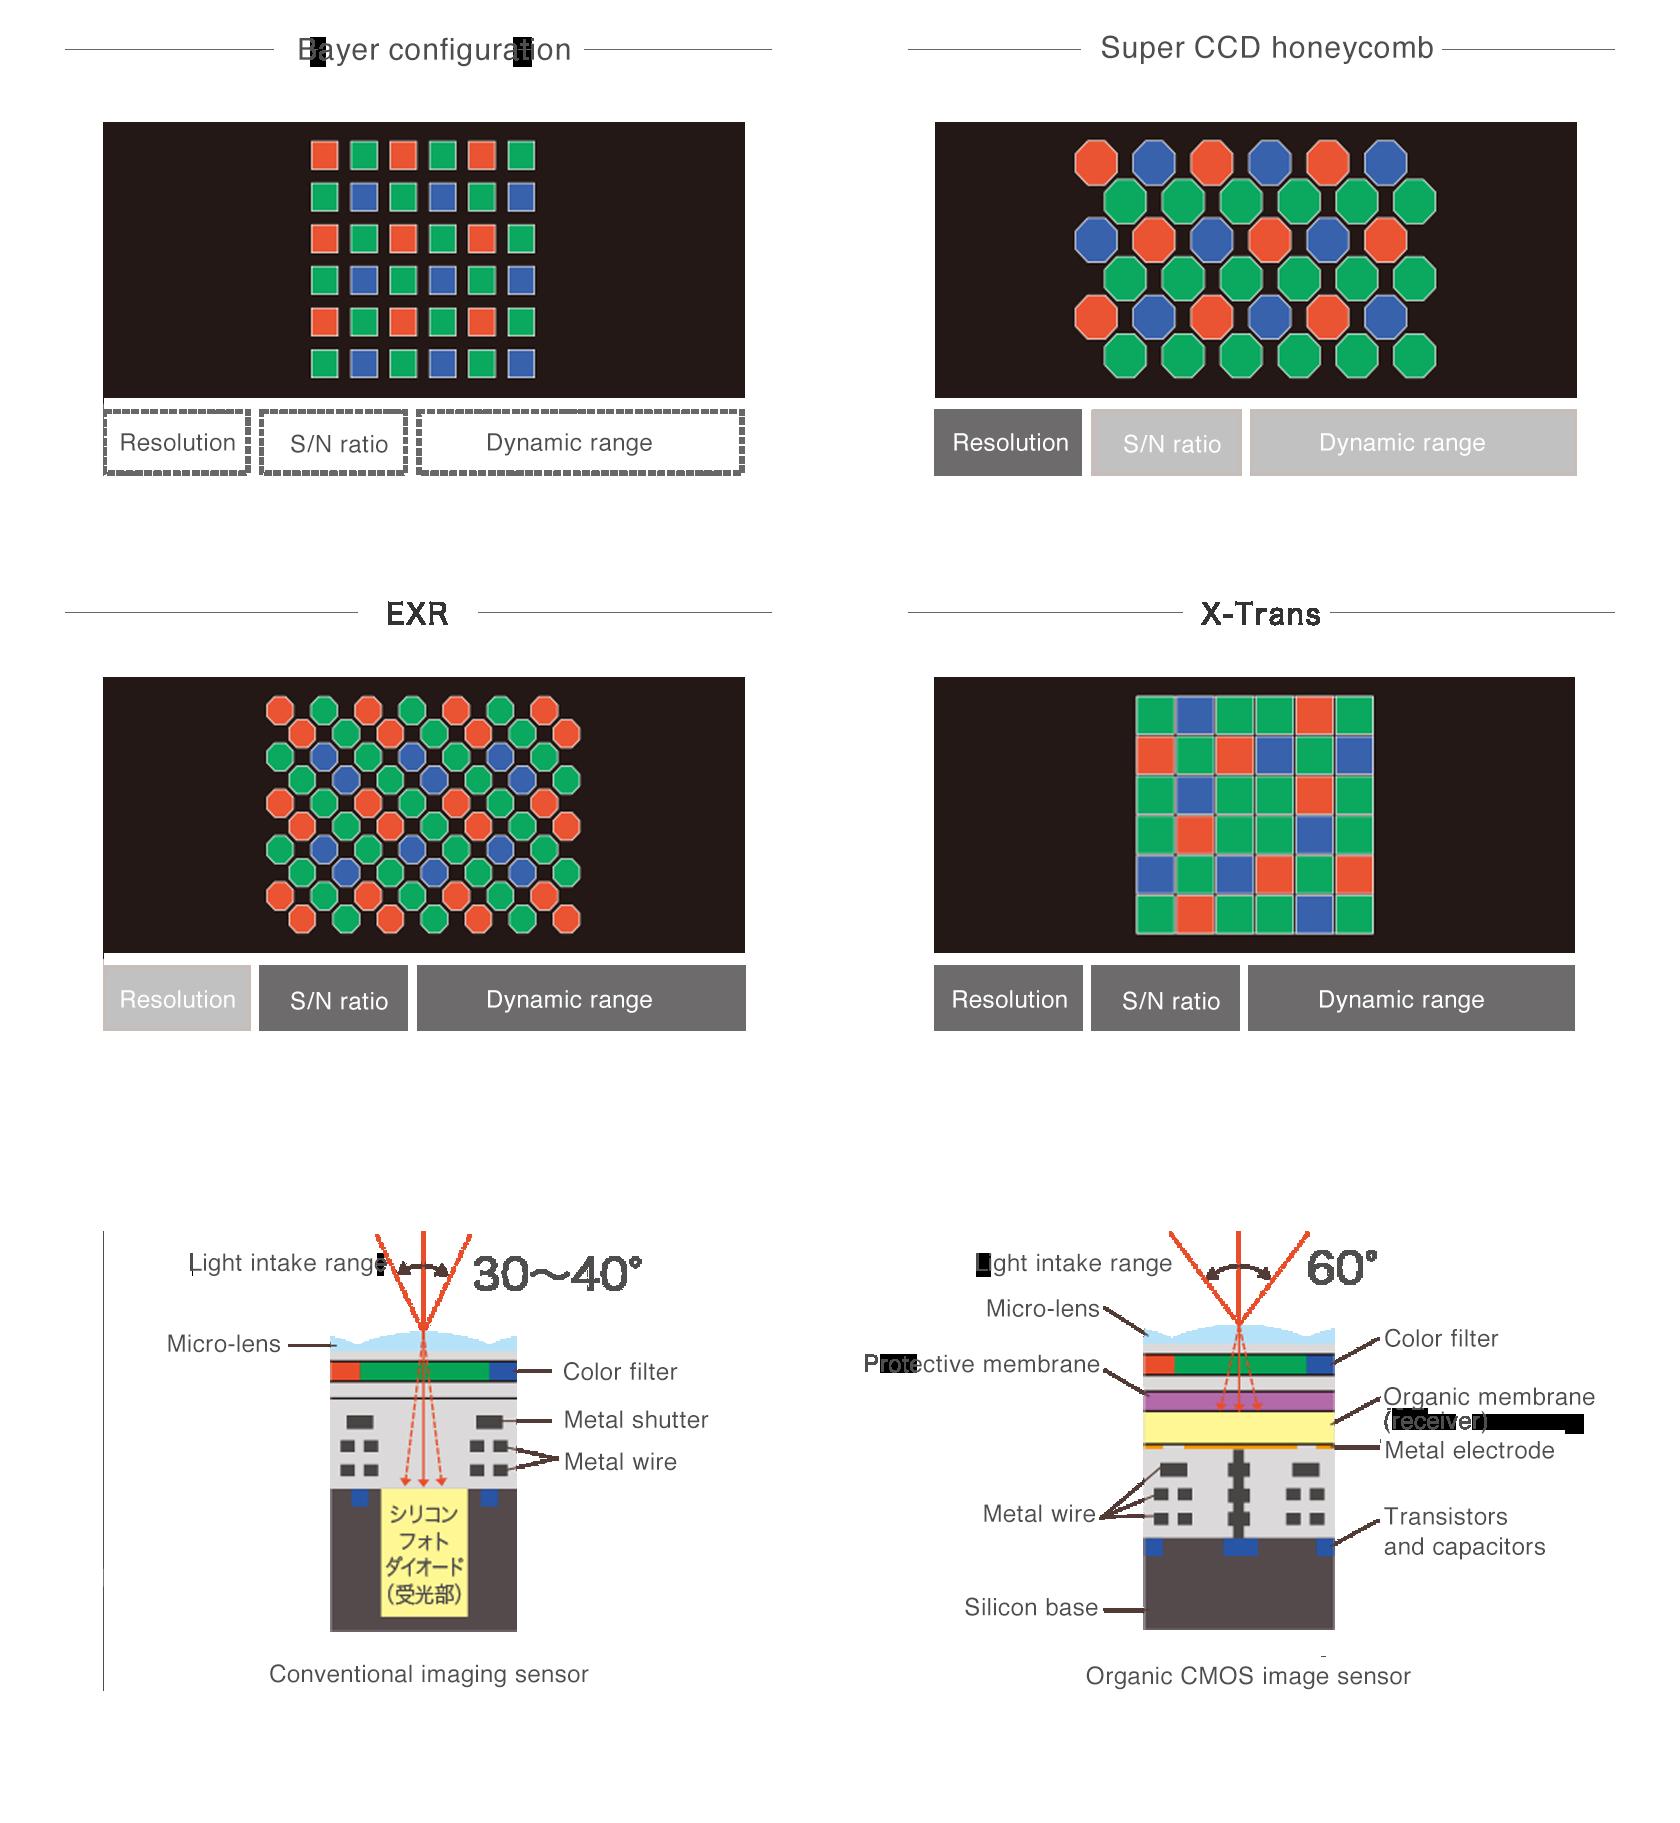 [image] Efforts to improve image quality